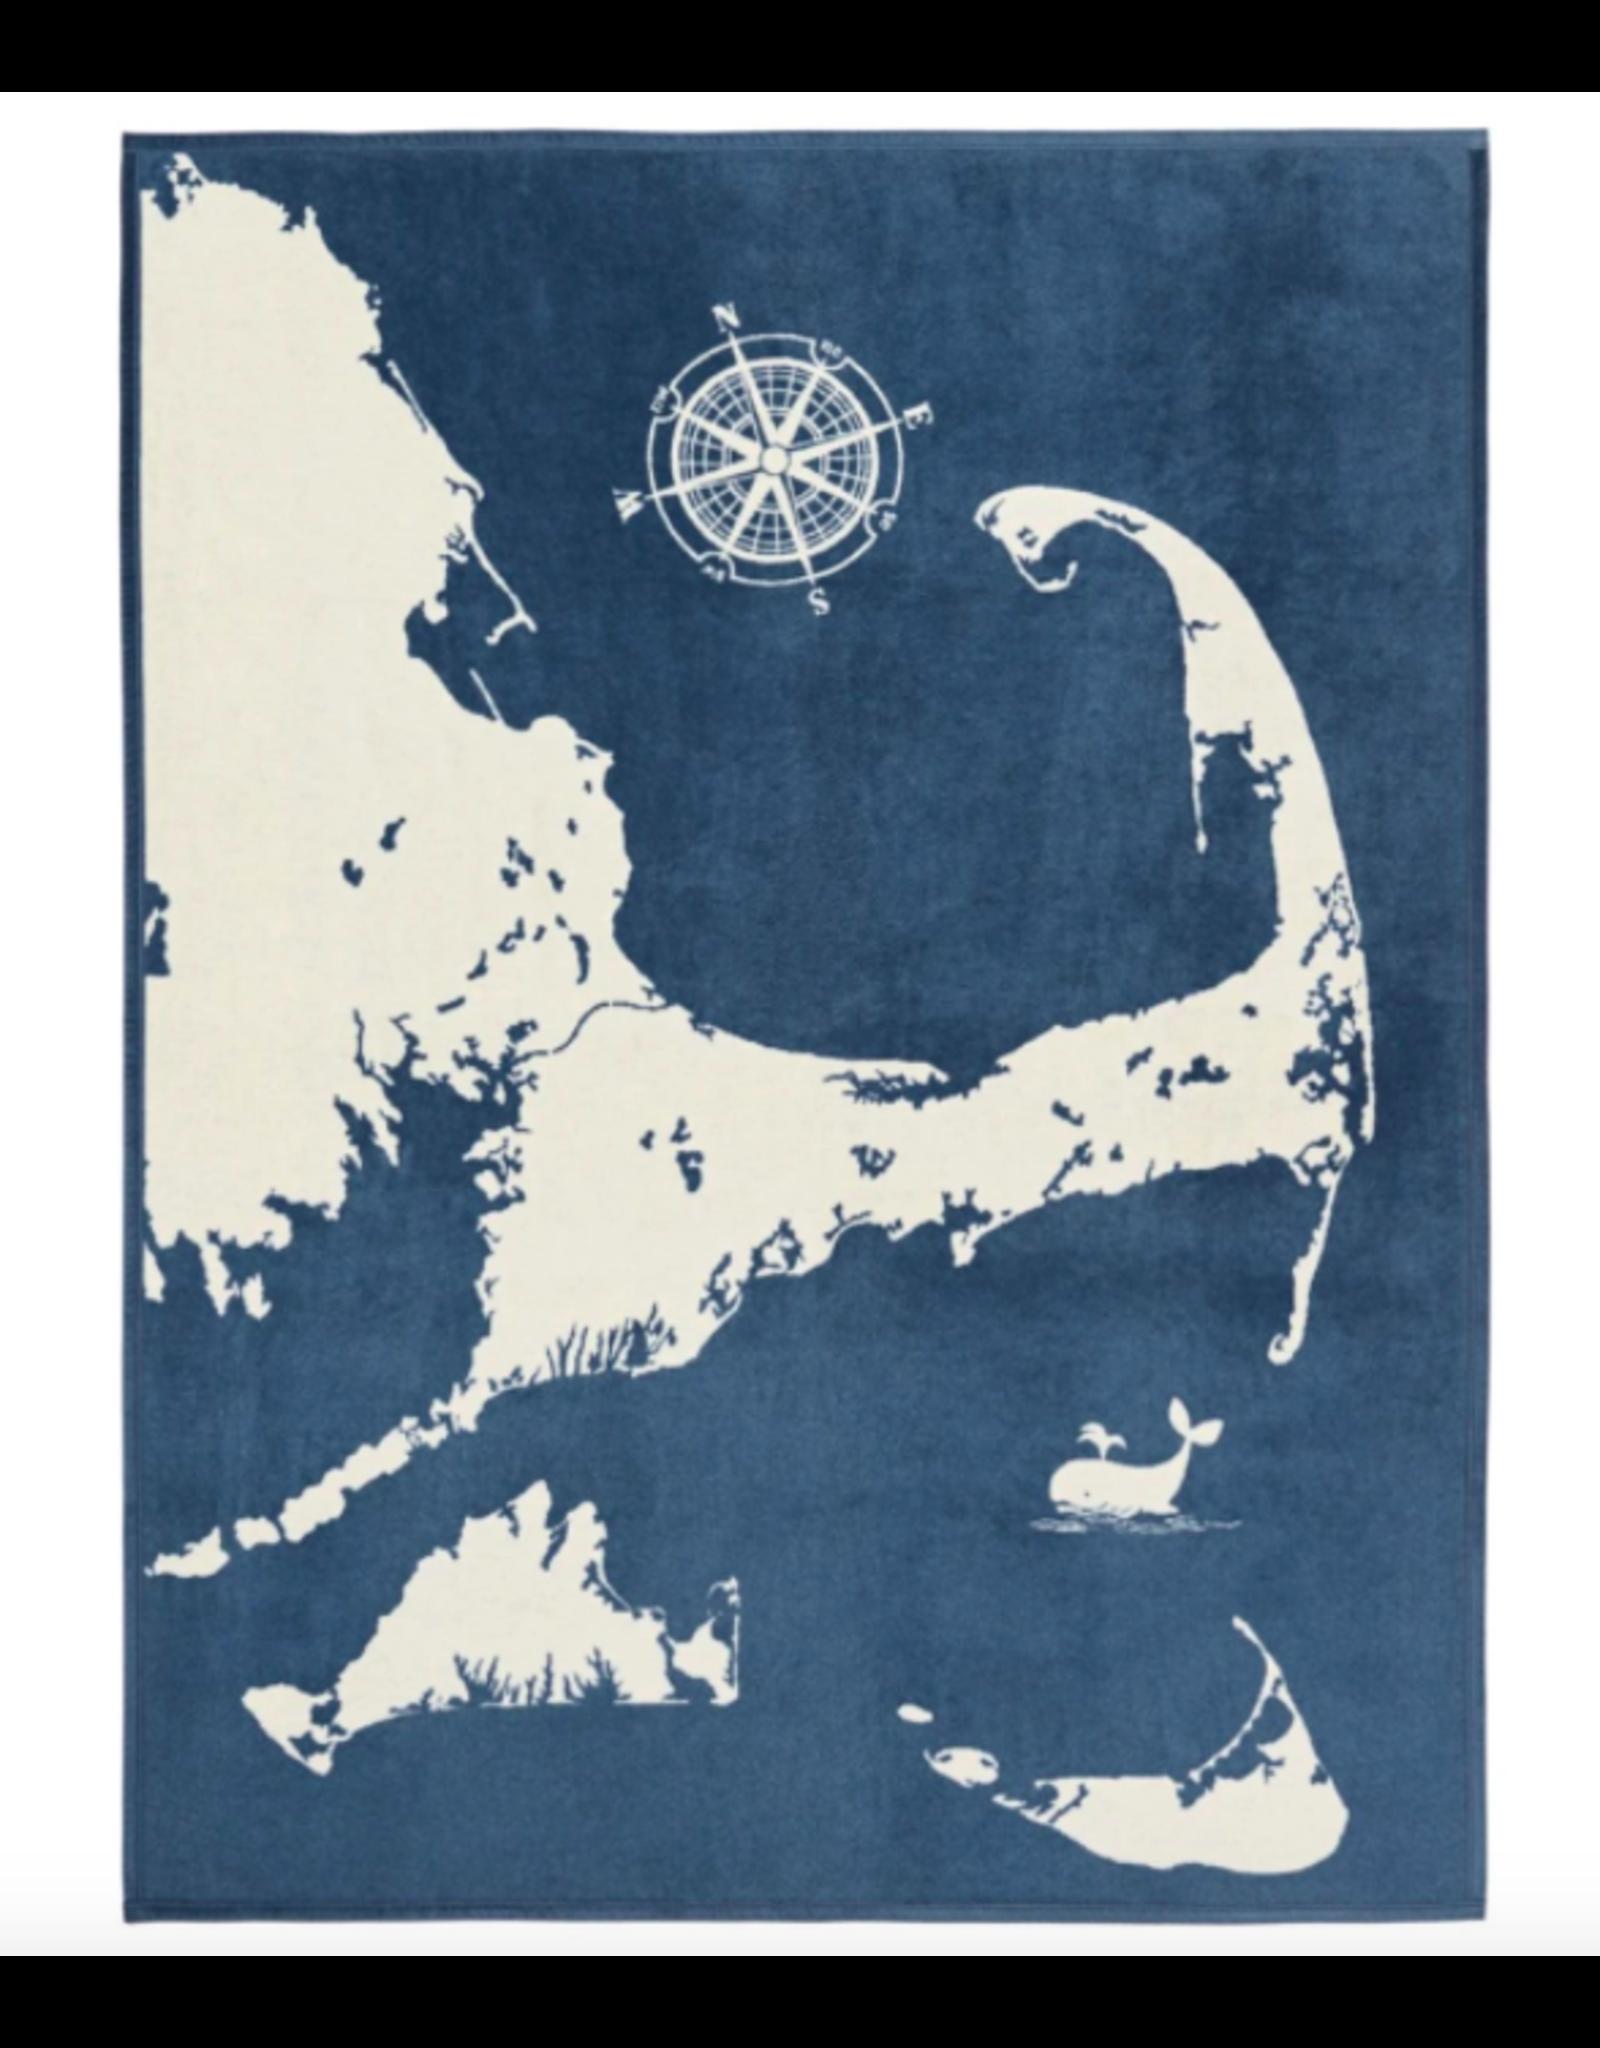 ChappyWrap Cape and Islands in Ocean Blue Blanket by ChappyWrap